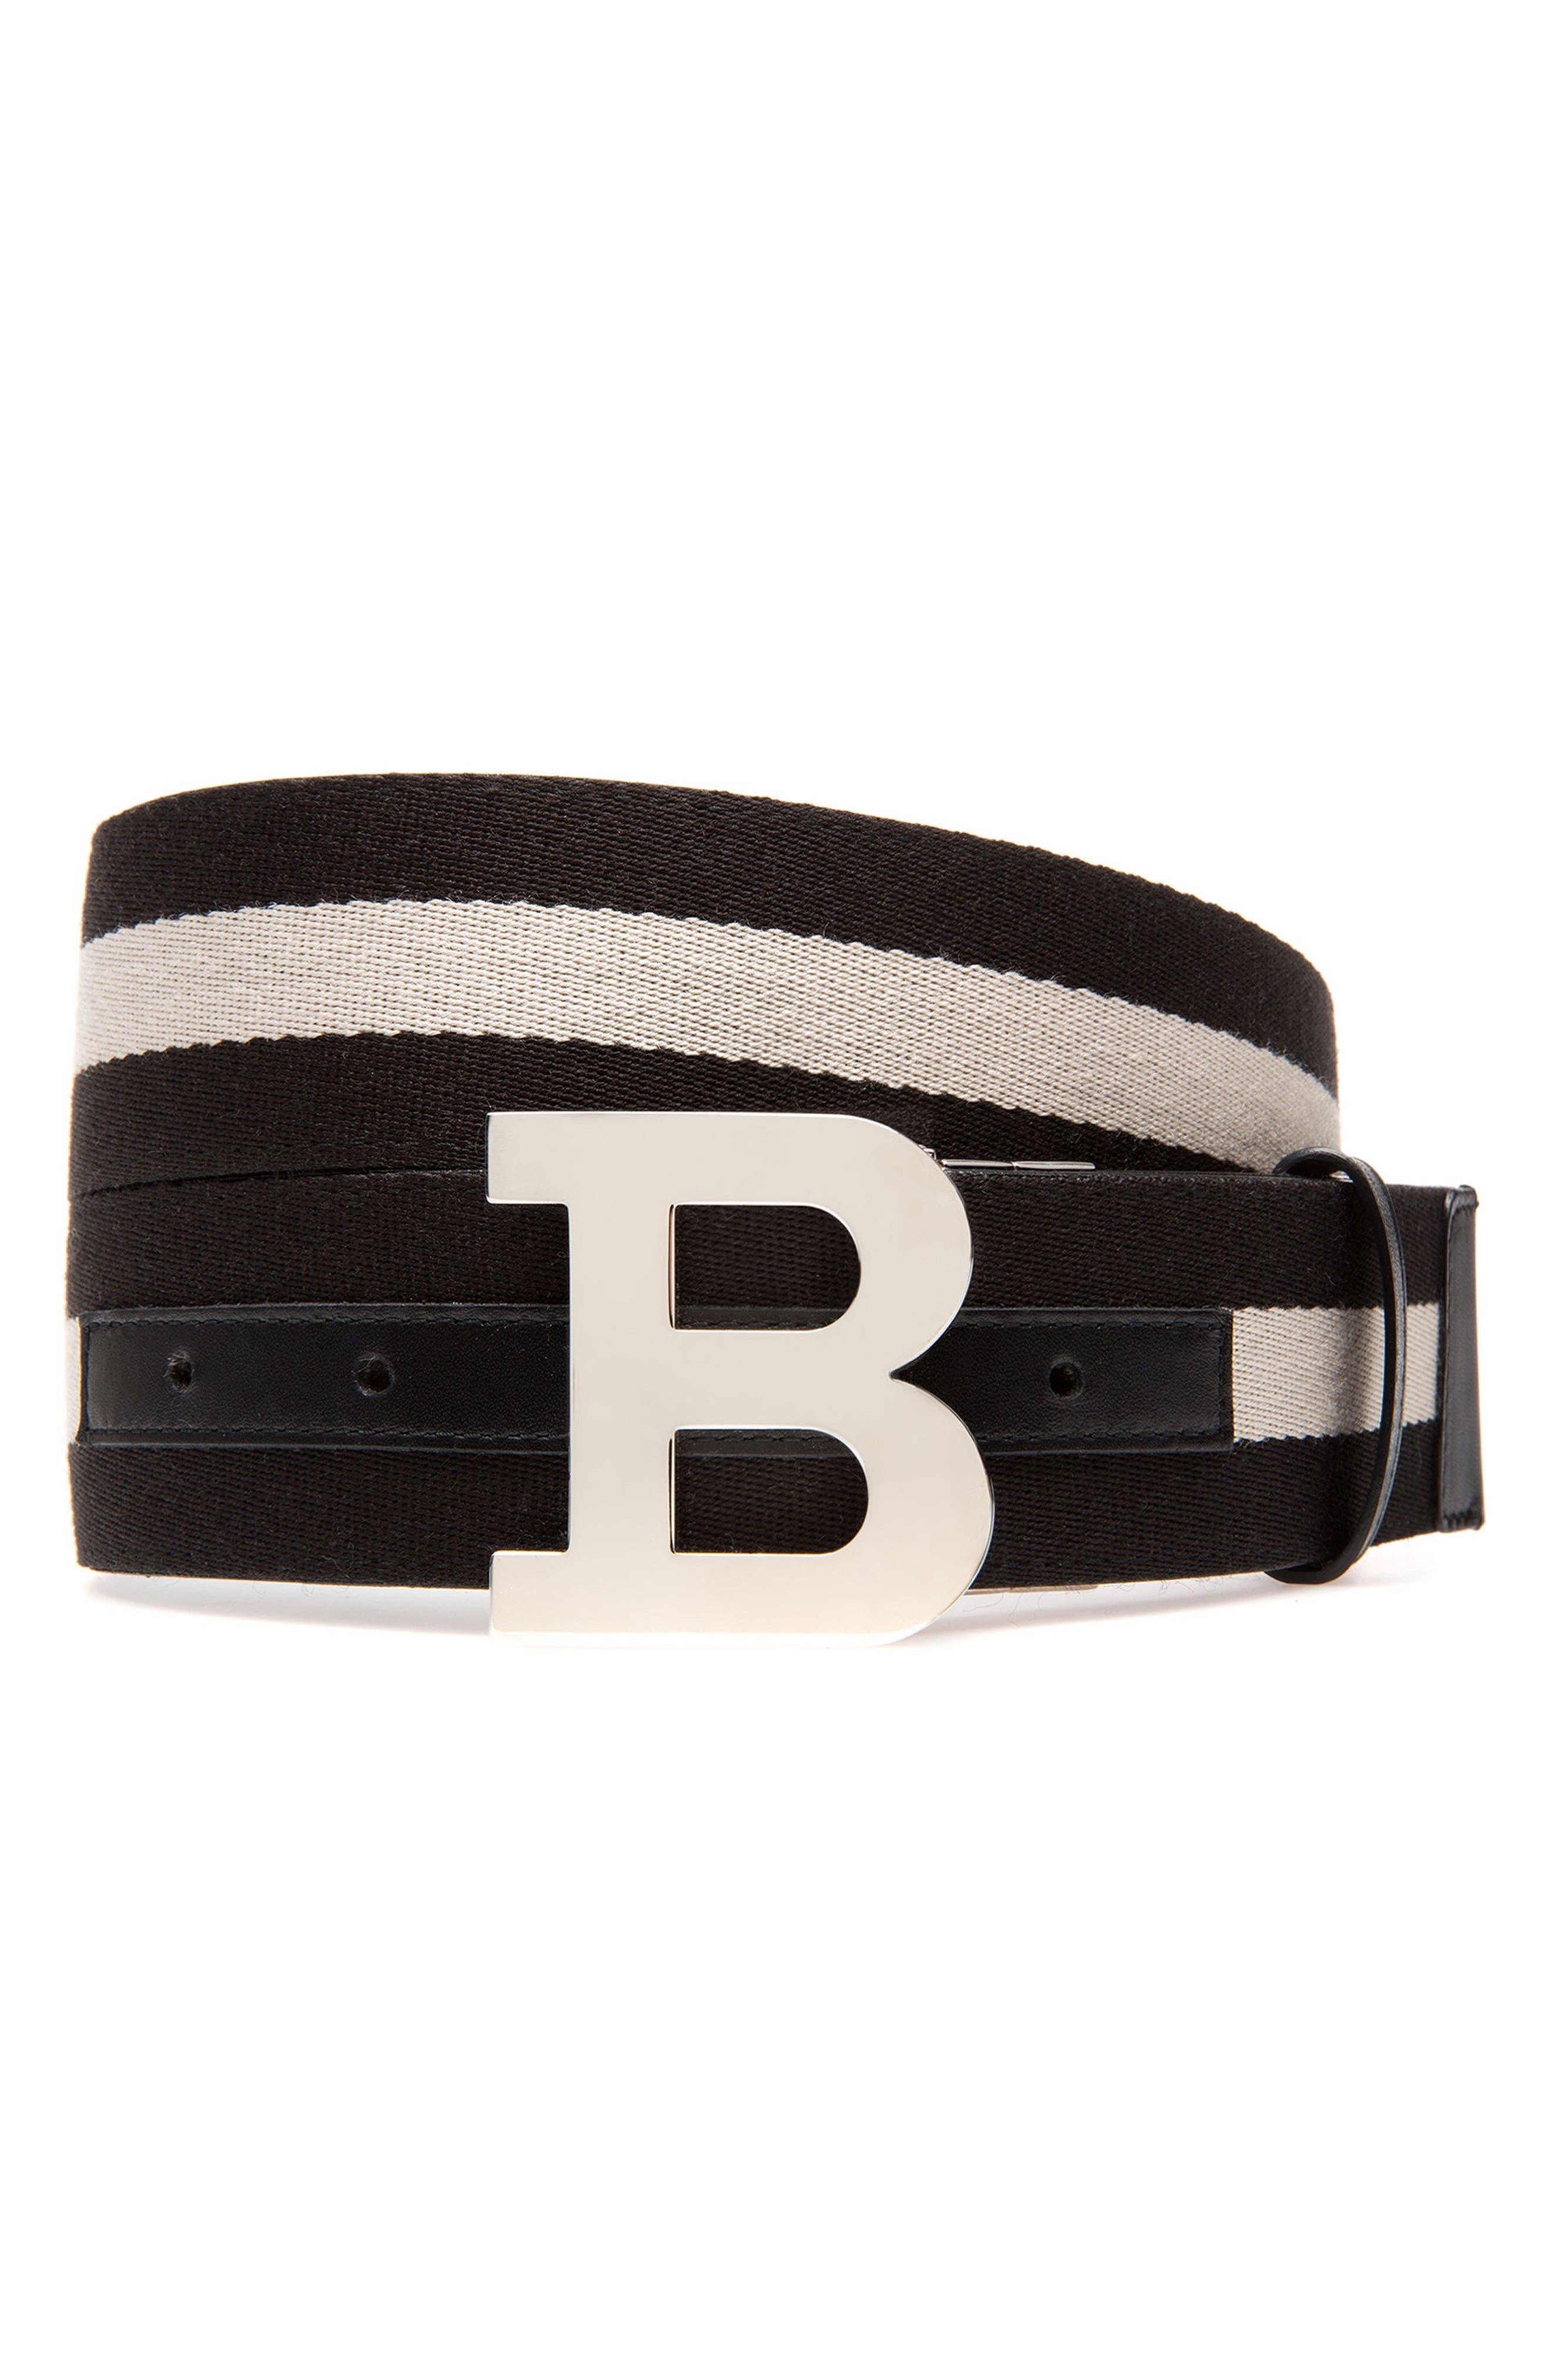 B-Buckle Reversible Webbed Belt,                             Main thumbnail 1, color,                             Black/ Bone